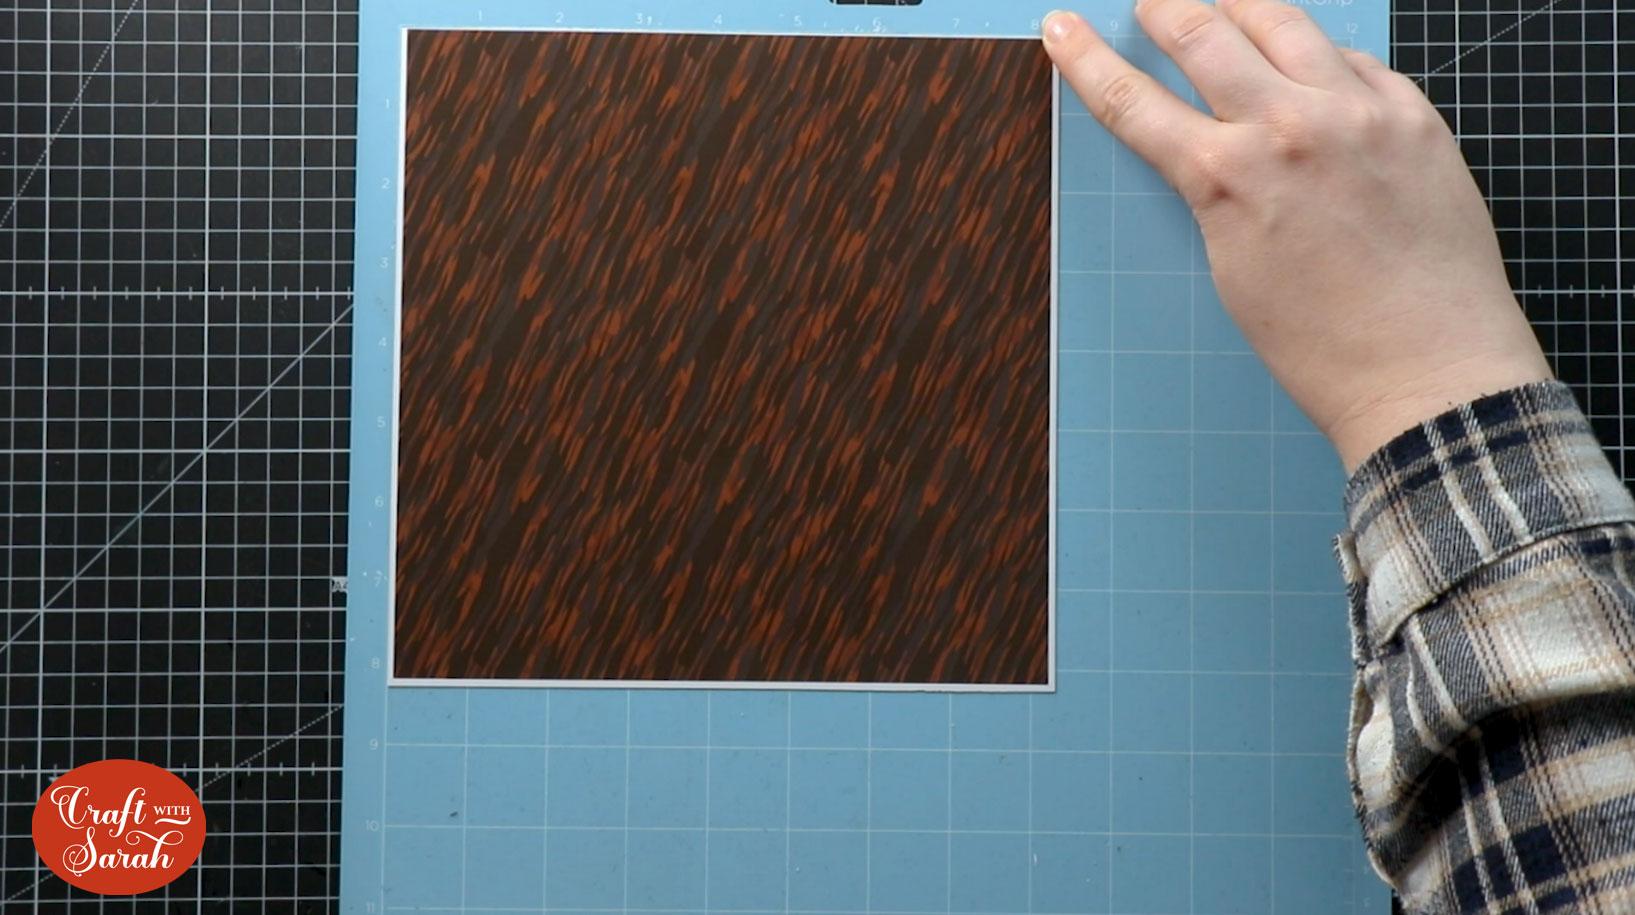 Position the pattern on Cricut mat